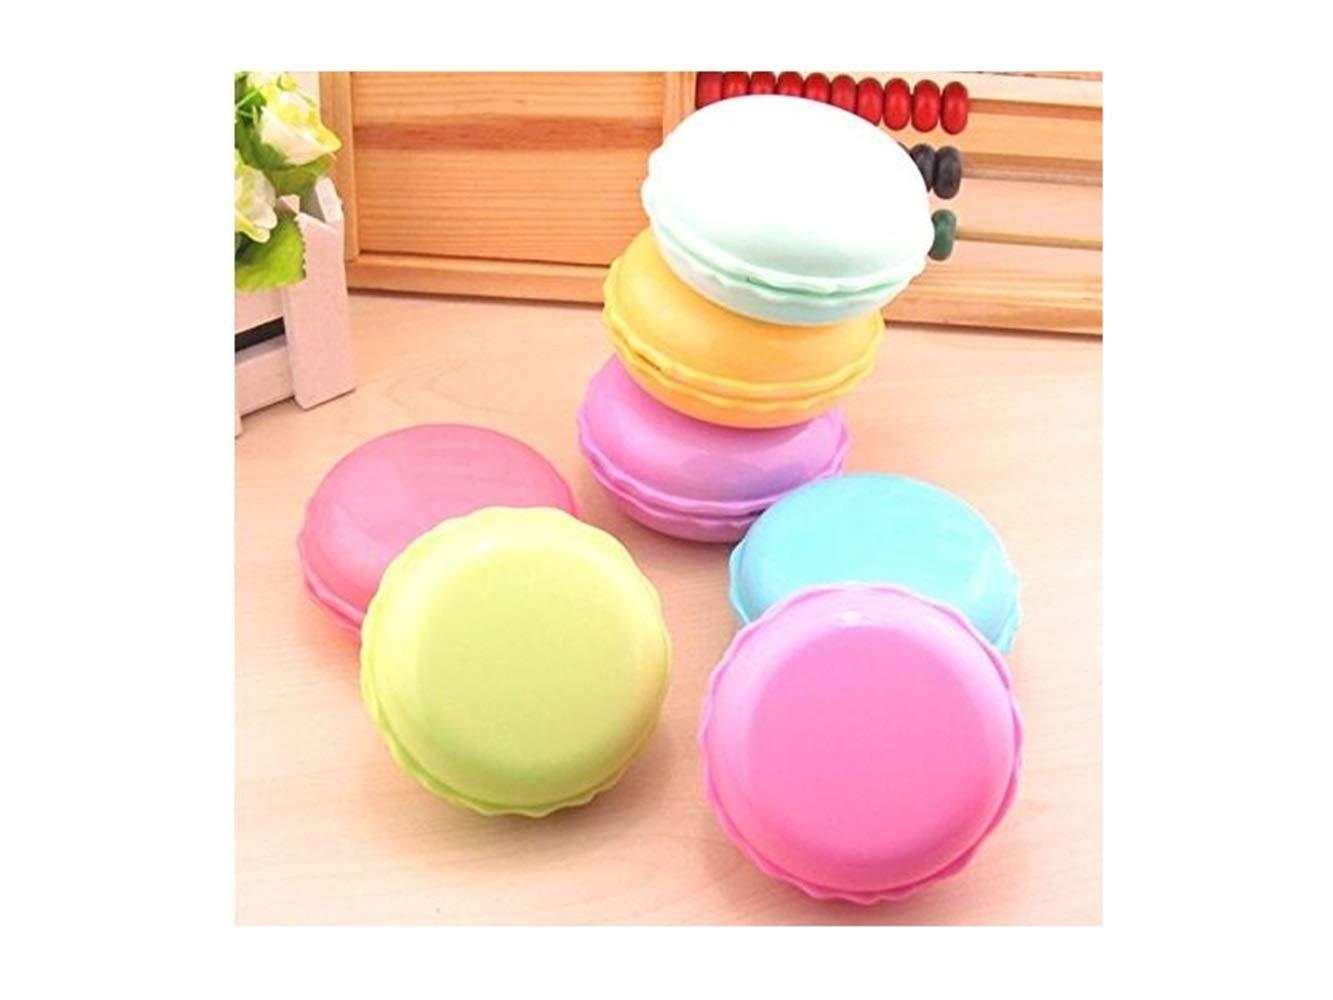 FOOBRTOPOO Mini Sweet Macarons Contact Lens Case Kit de Viaje con Espejo Pinzas Stick y Solution Bottle Limpiar (tamaño : 7.5 * 7.5 * 3.5cm)